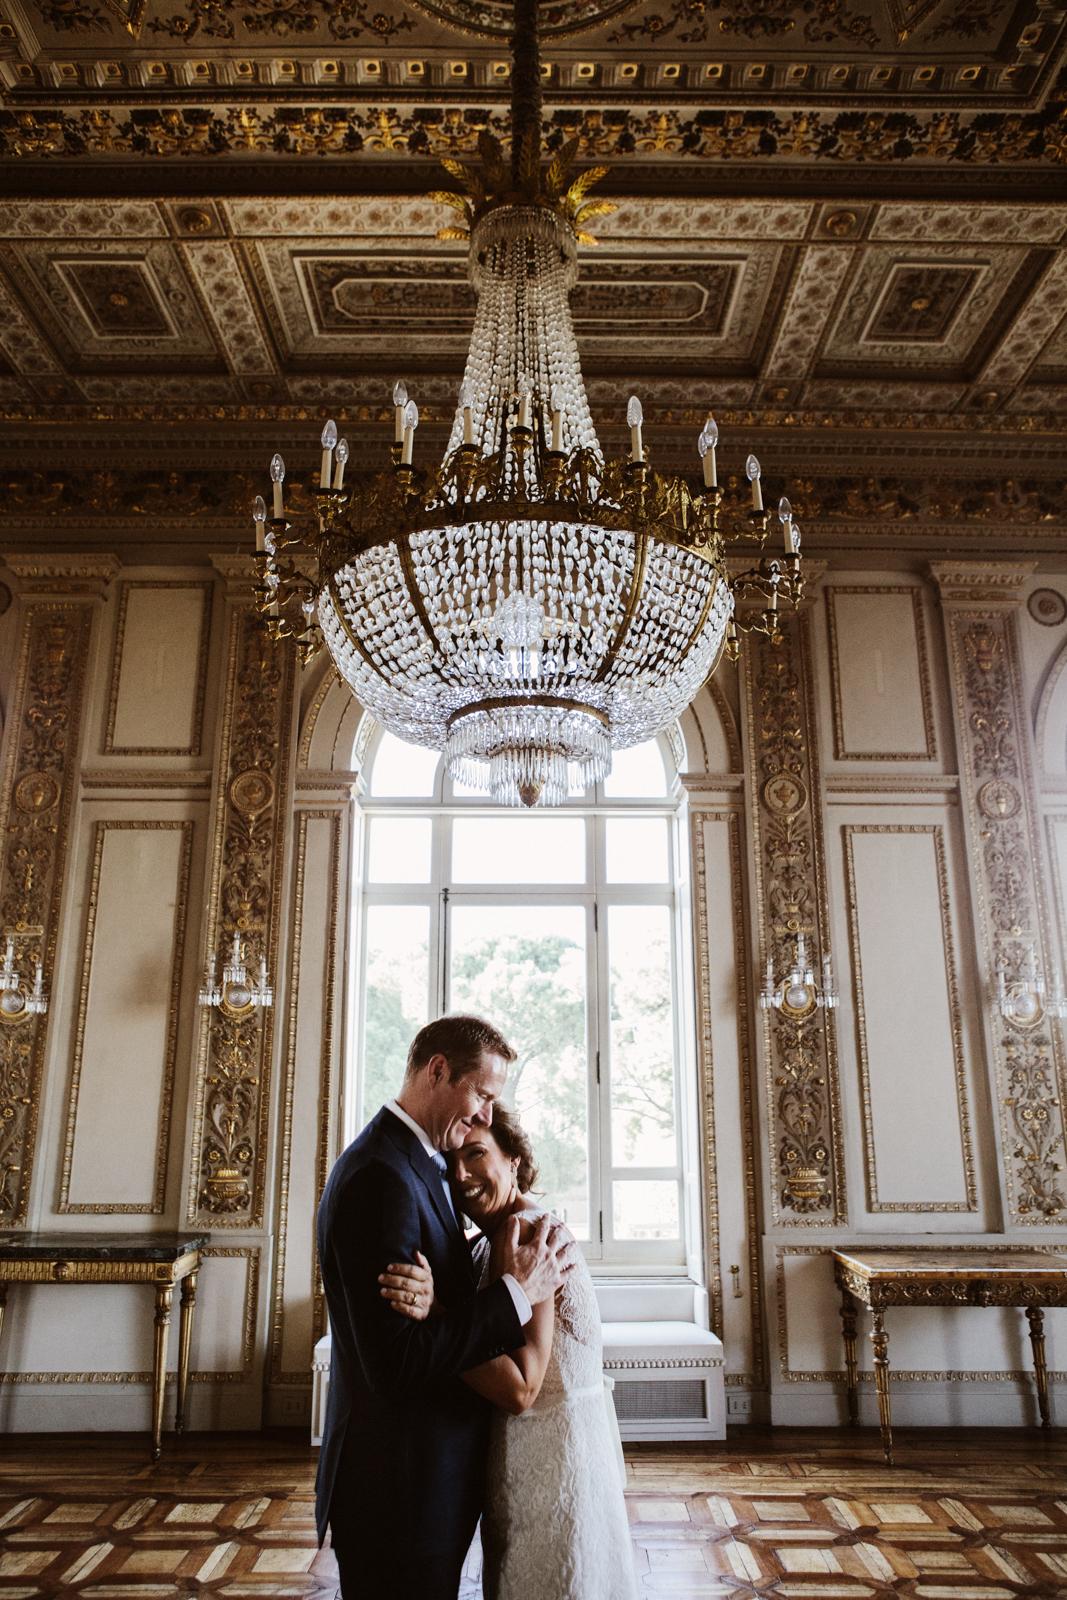 A Luxury Pastel-Palette Destination Rome Wedding - The Overwhelmed Bride Wedding Ideas Inspiration Blog